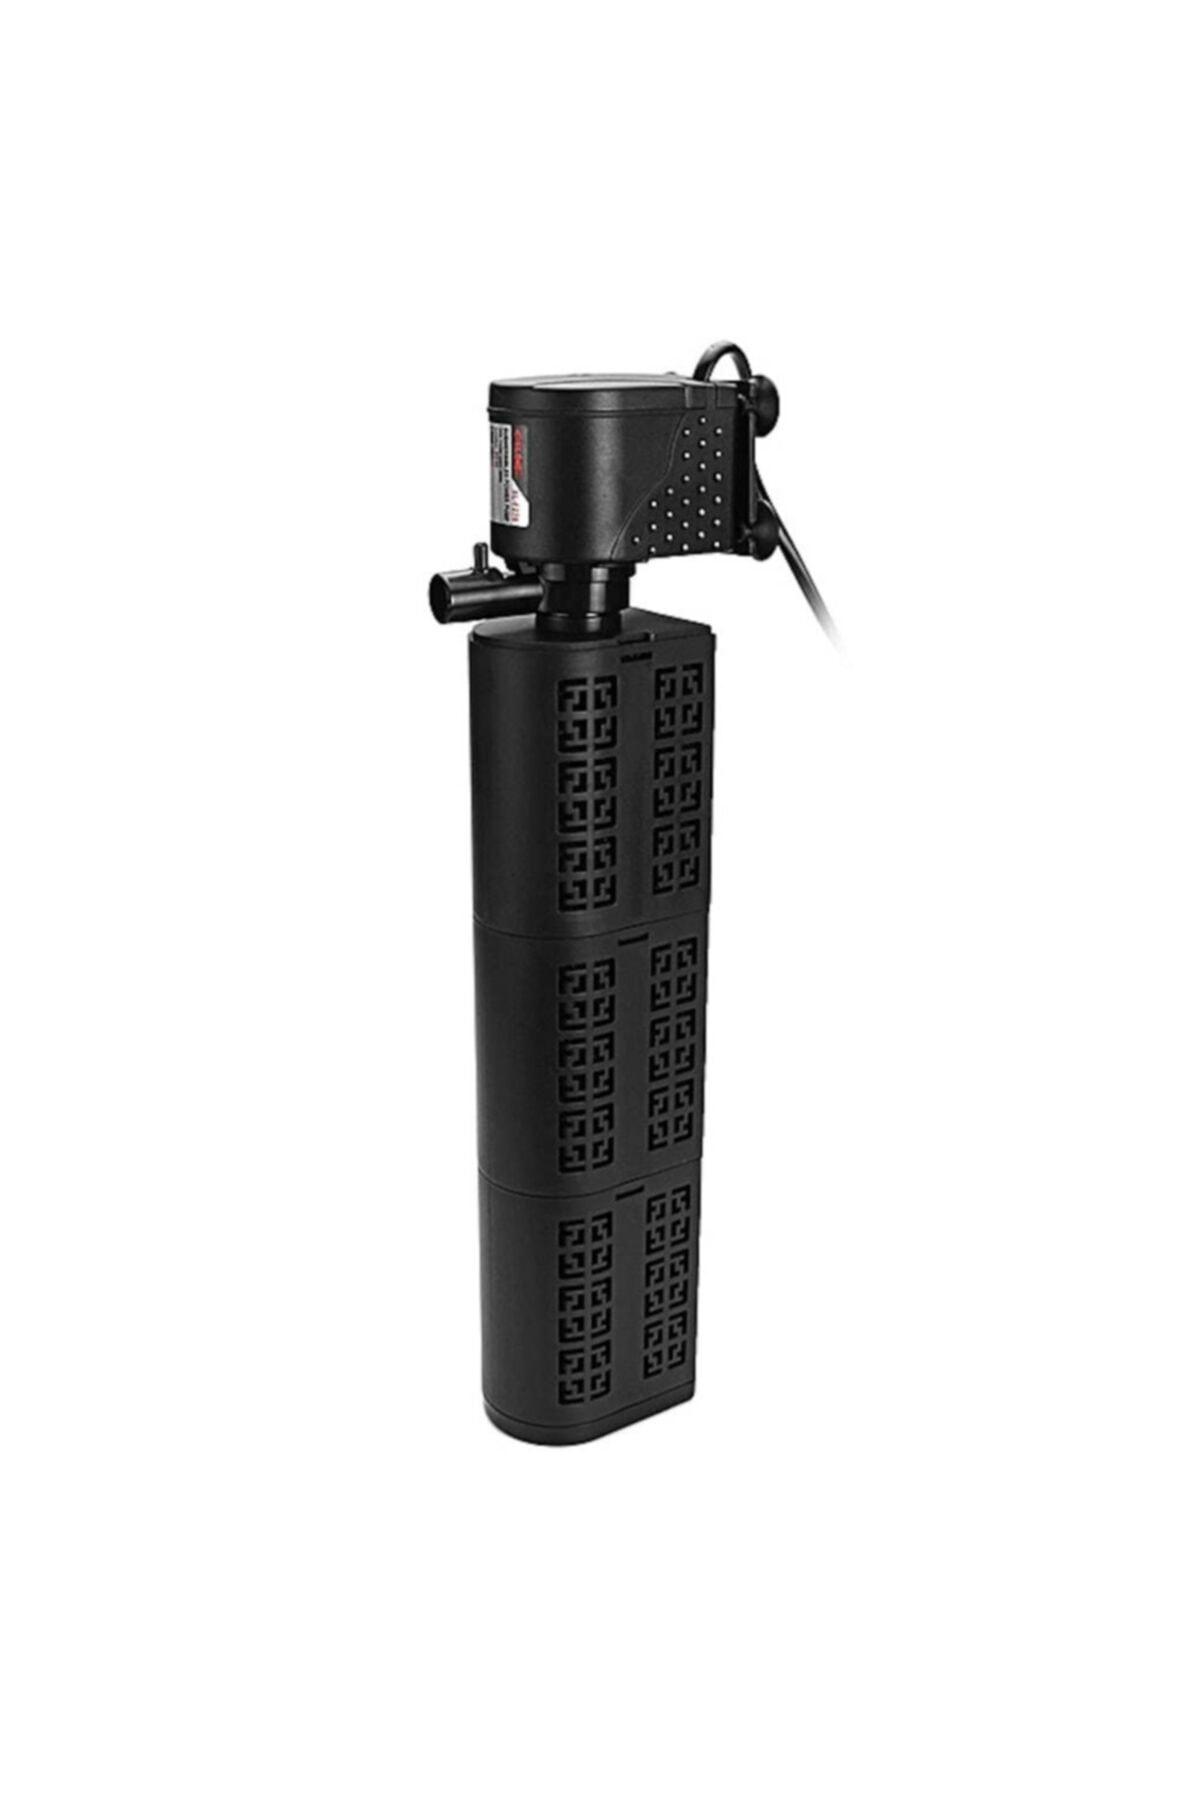 Xilong XL-F270 Akvaryum İç Filtre 1800 L/saat 28 W